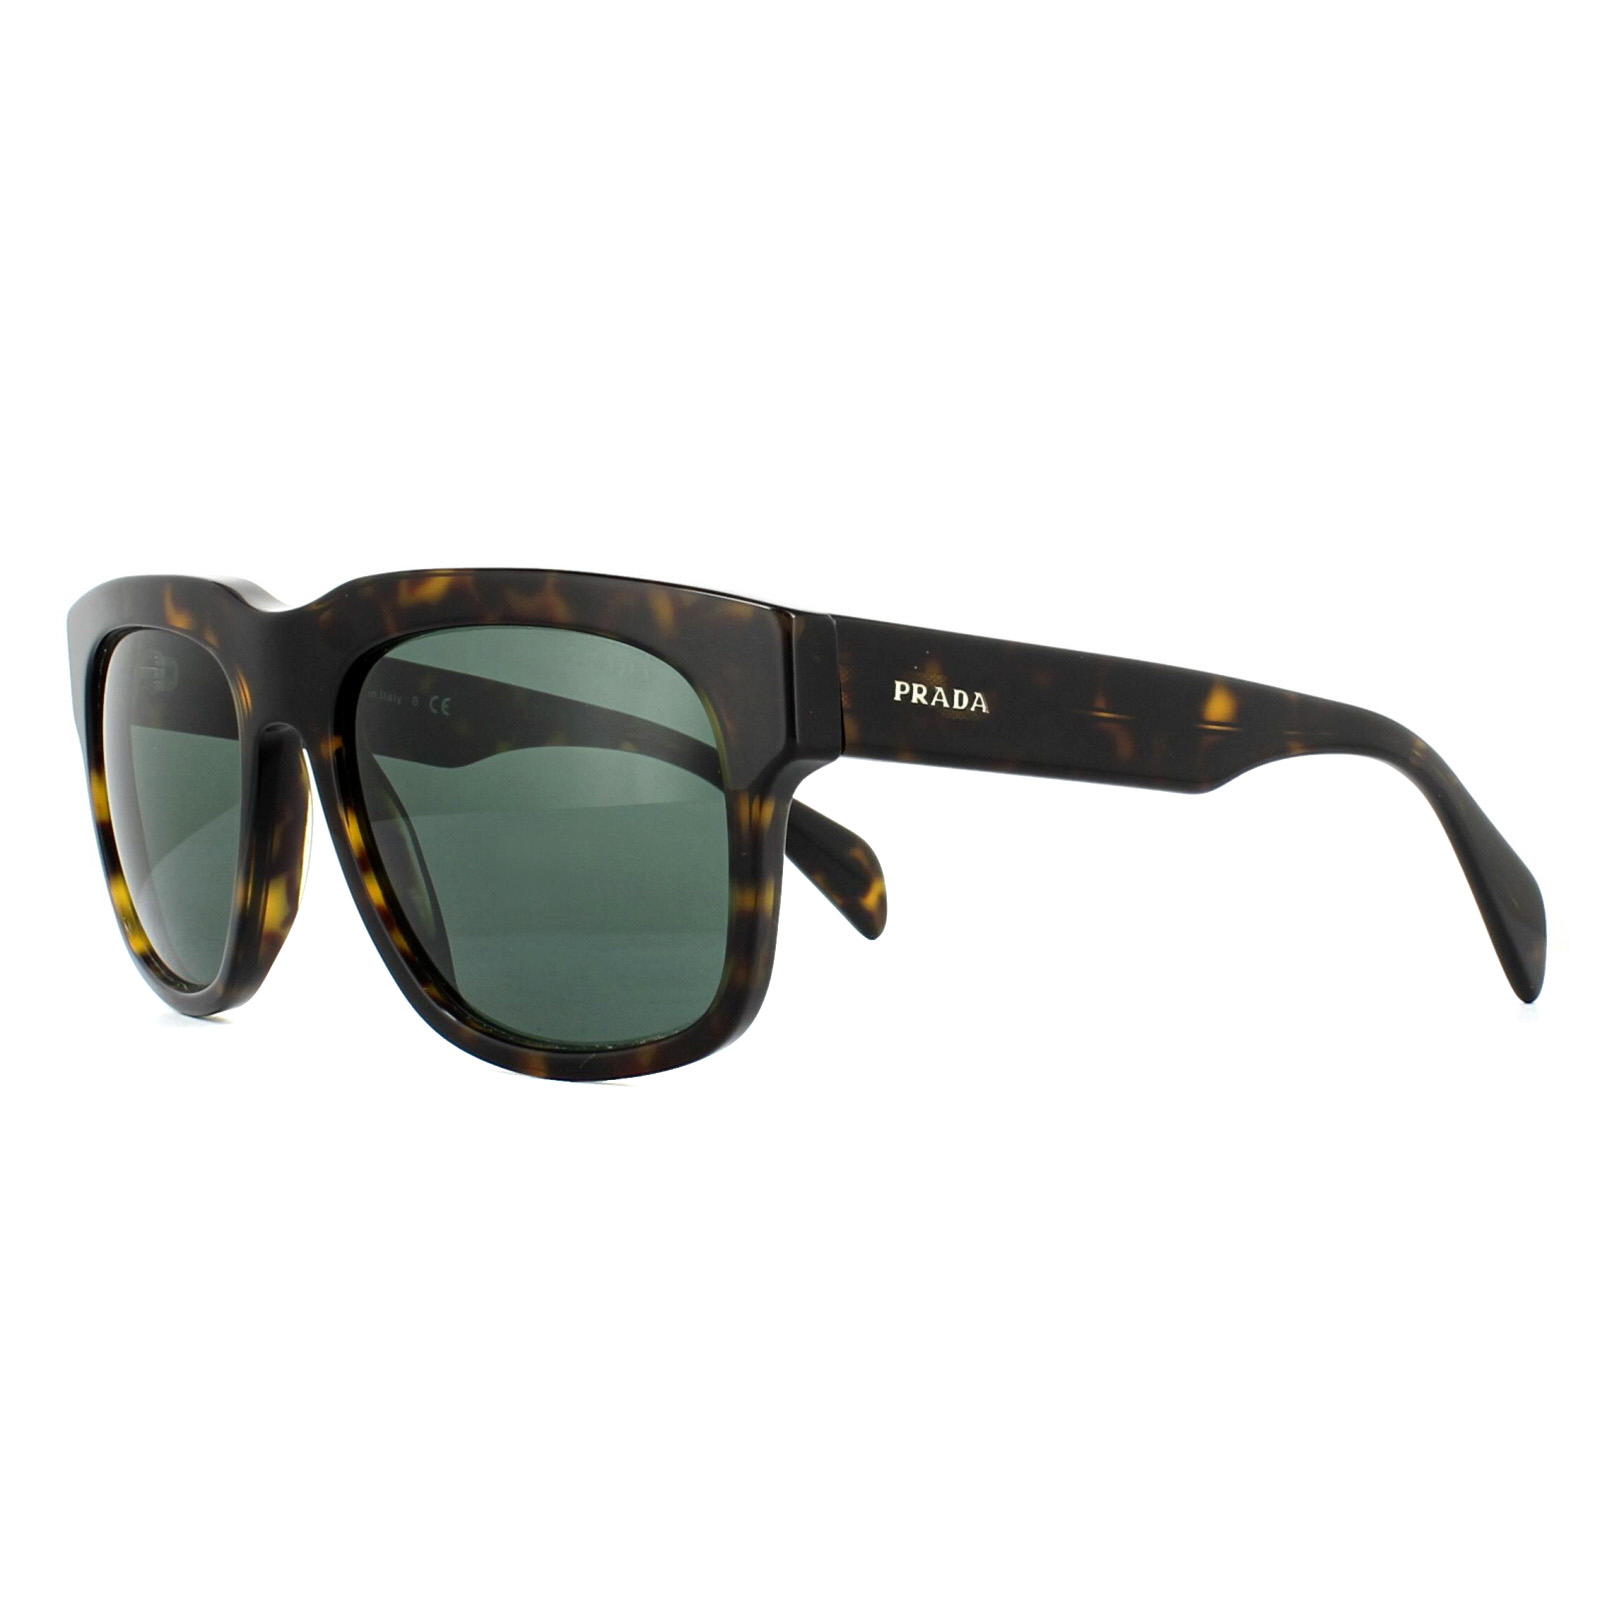 7cc2d961f78a Prada Sunglasses 14QS 2AU3O1 Havana Green 8053672194425